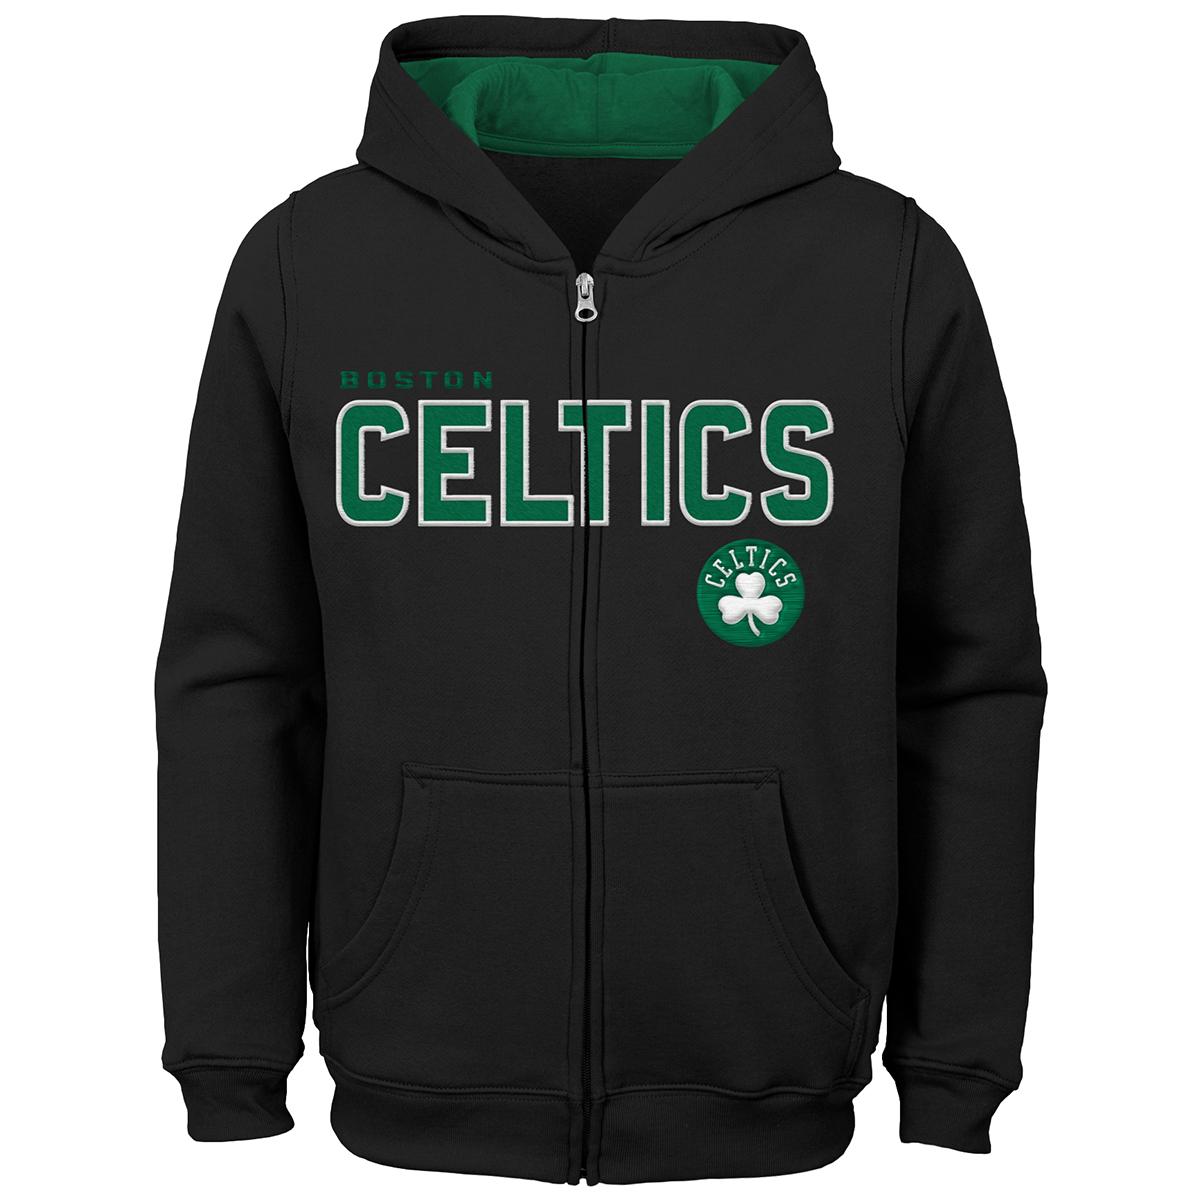 Boston Celtics Boys' Stated Full Zip Hoodie - Black, L